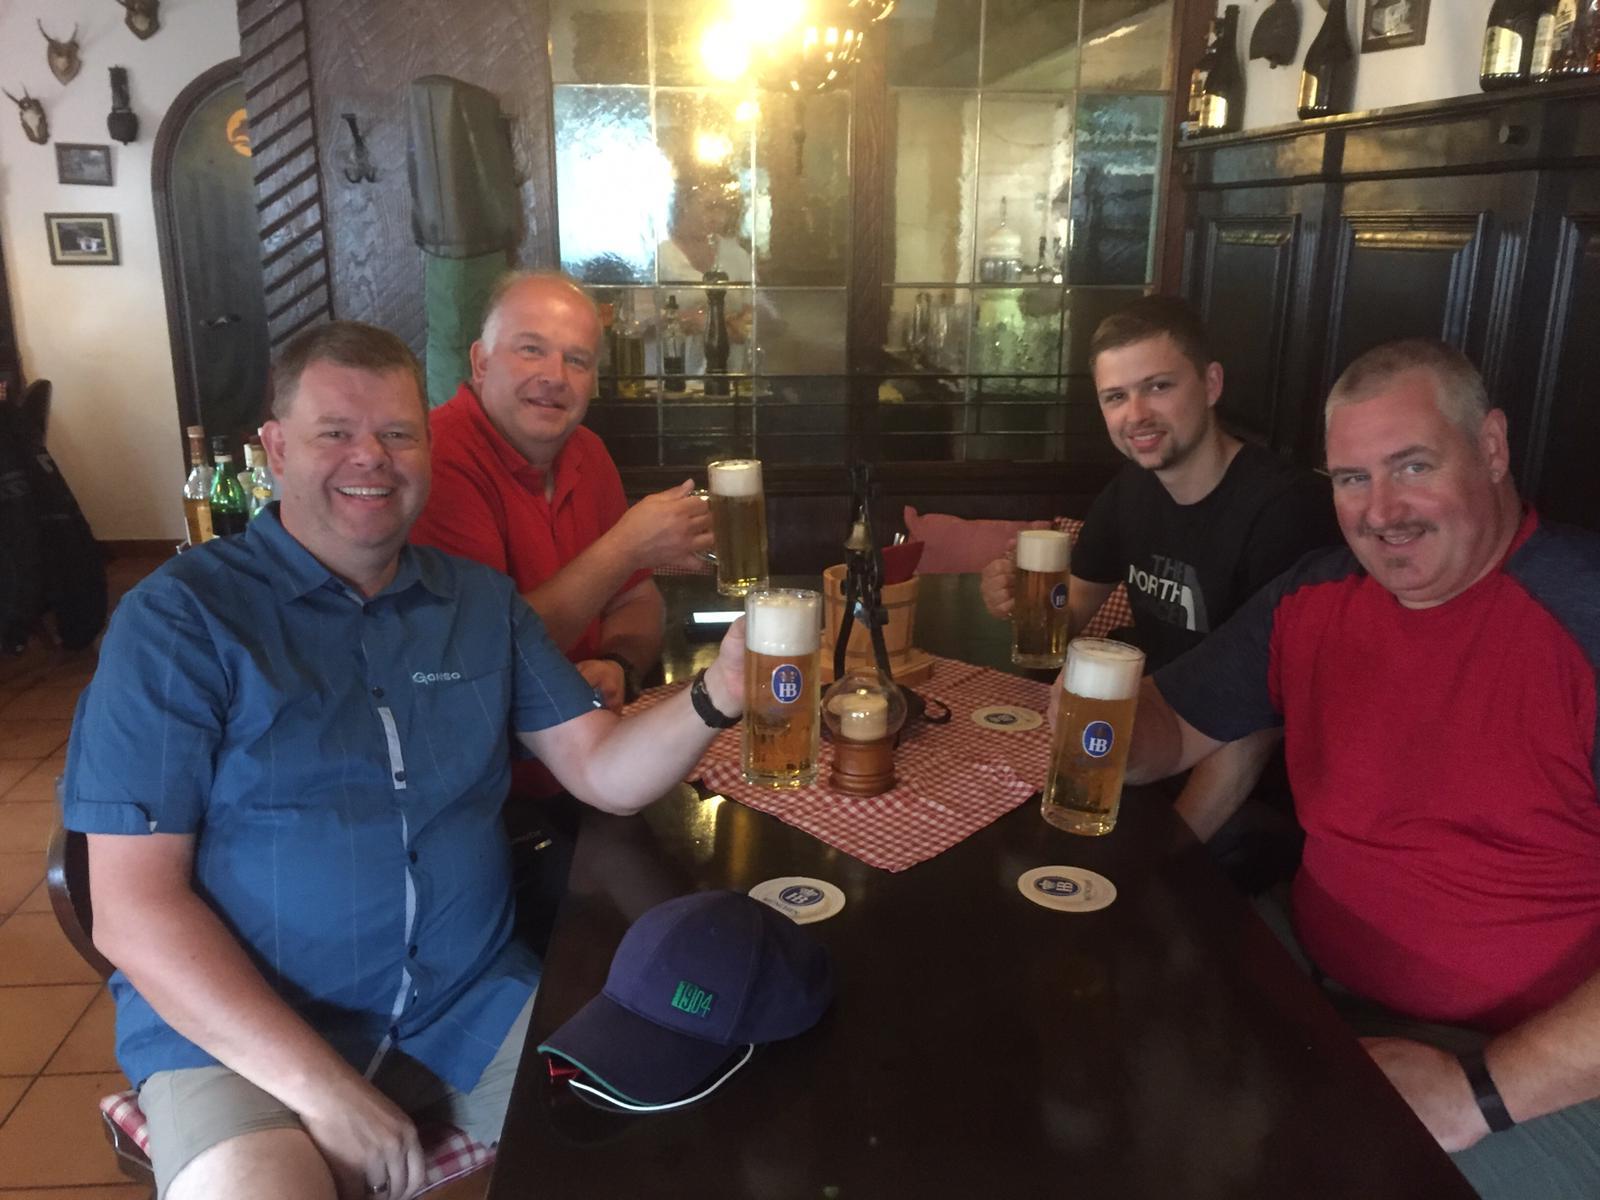 GSB – Tagebuch 15.08.19 – Ins Fuchstal mit den Tippelbrüdern!